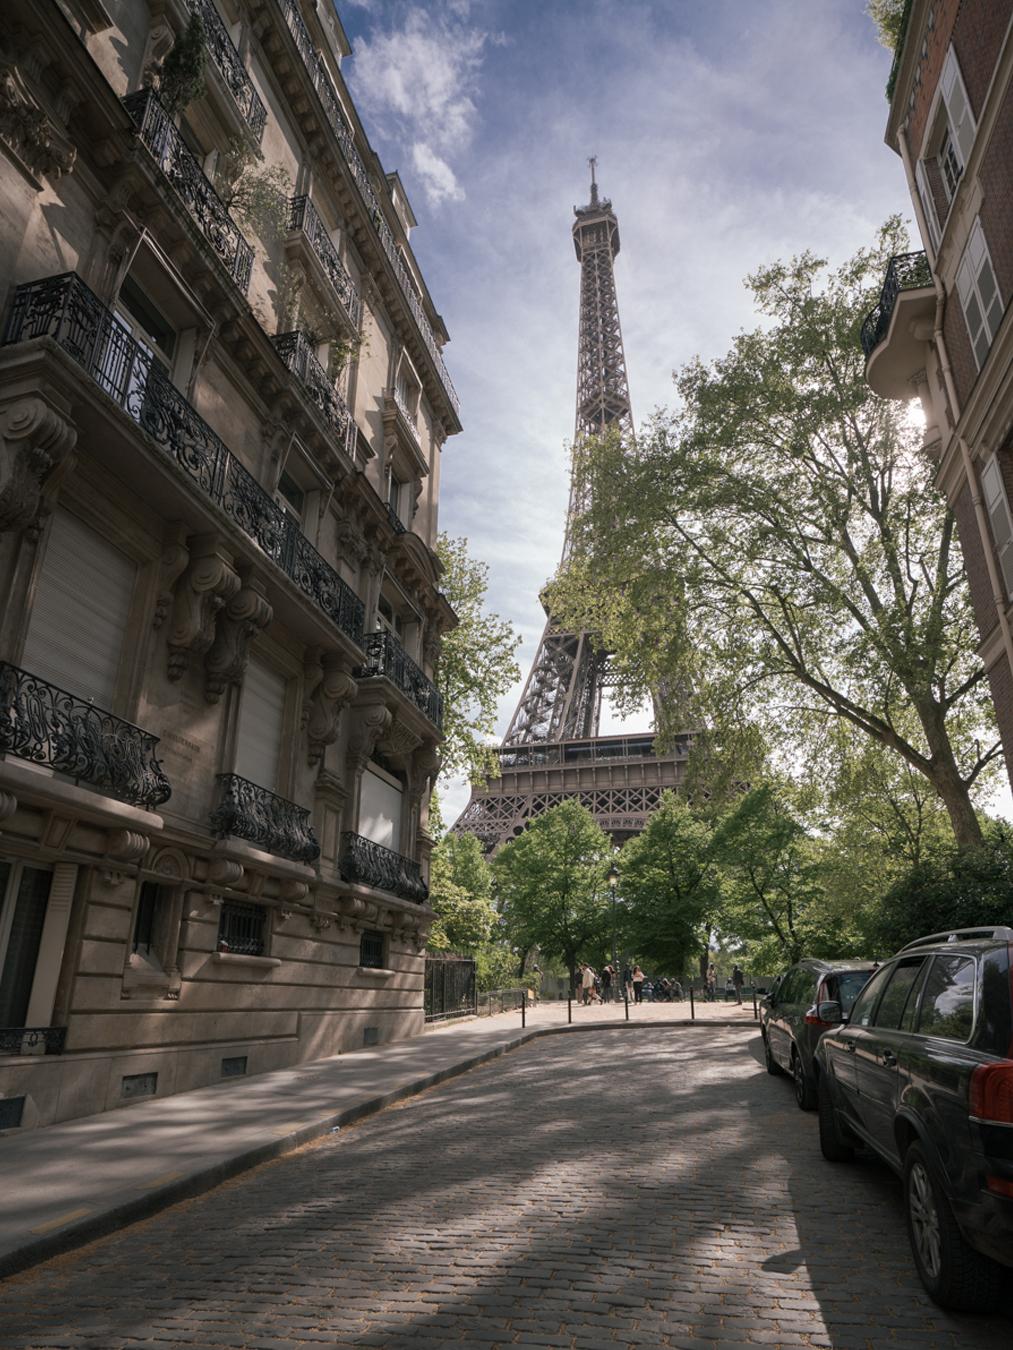 dvsn-collective-journal-paris-france-travel-2